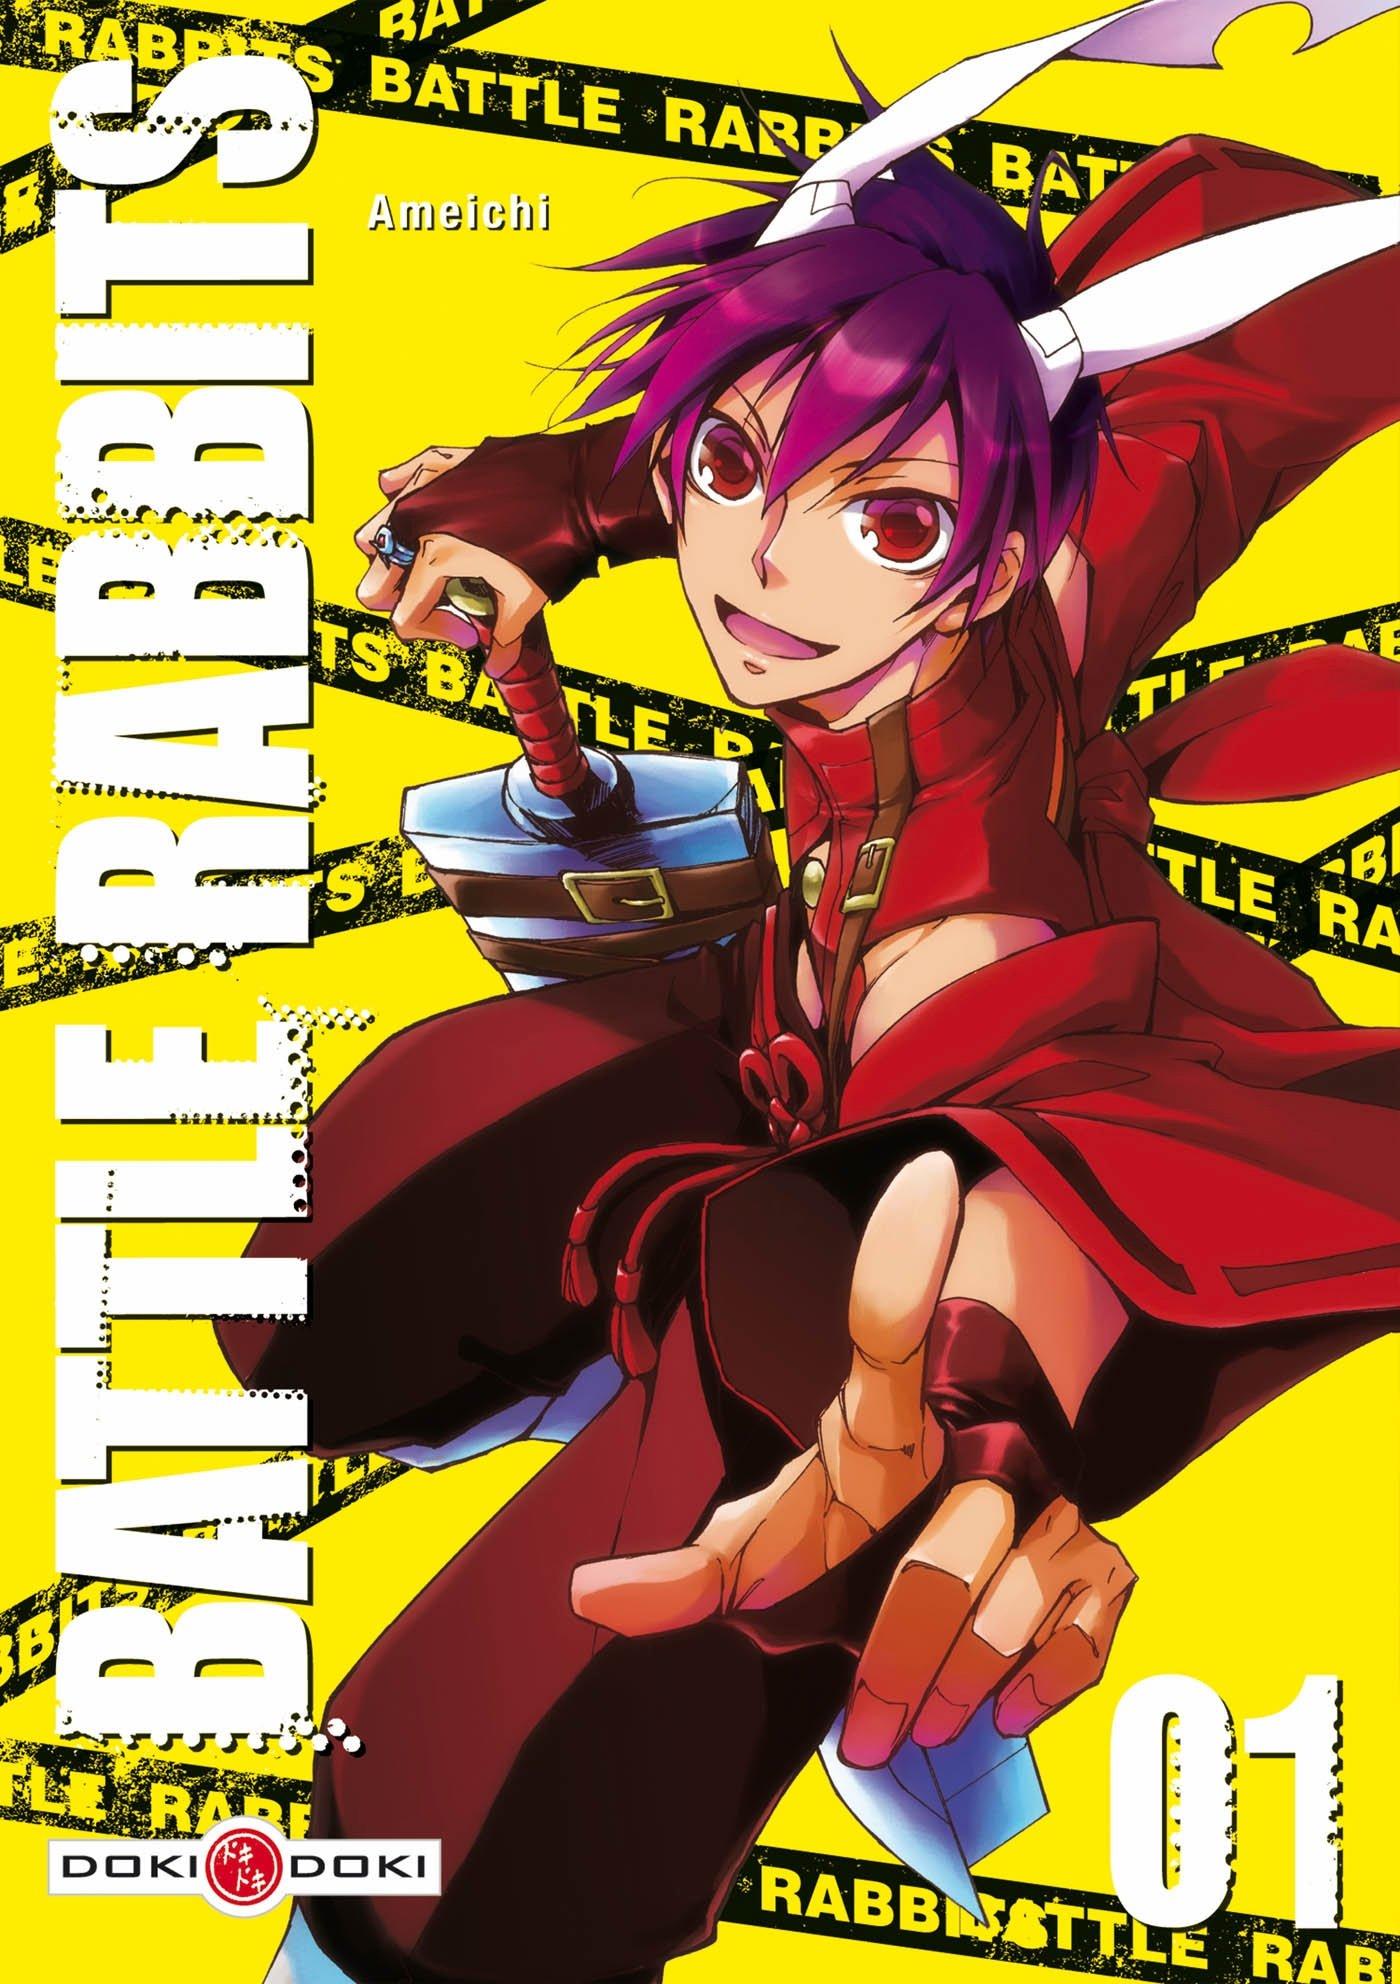 battle-rabbits-manga-1-simple-275183